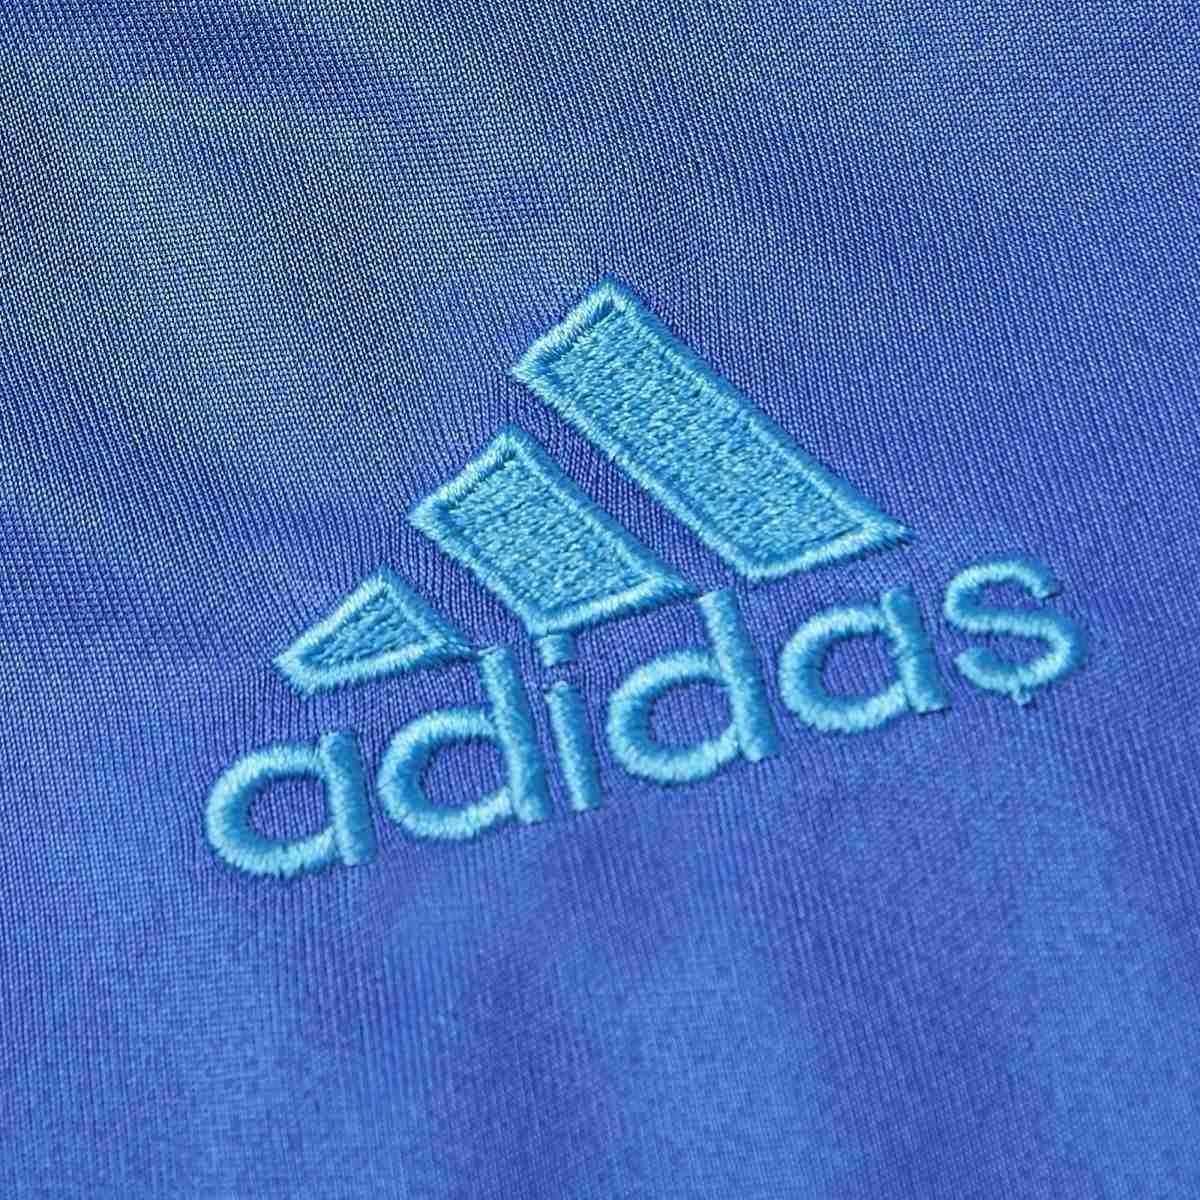 camisa adidas fluminense goleiro 14 15 original frete gratis. Carregando  zoom. 668c0ebc3bf18